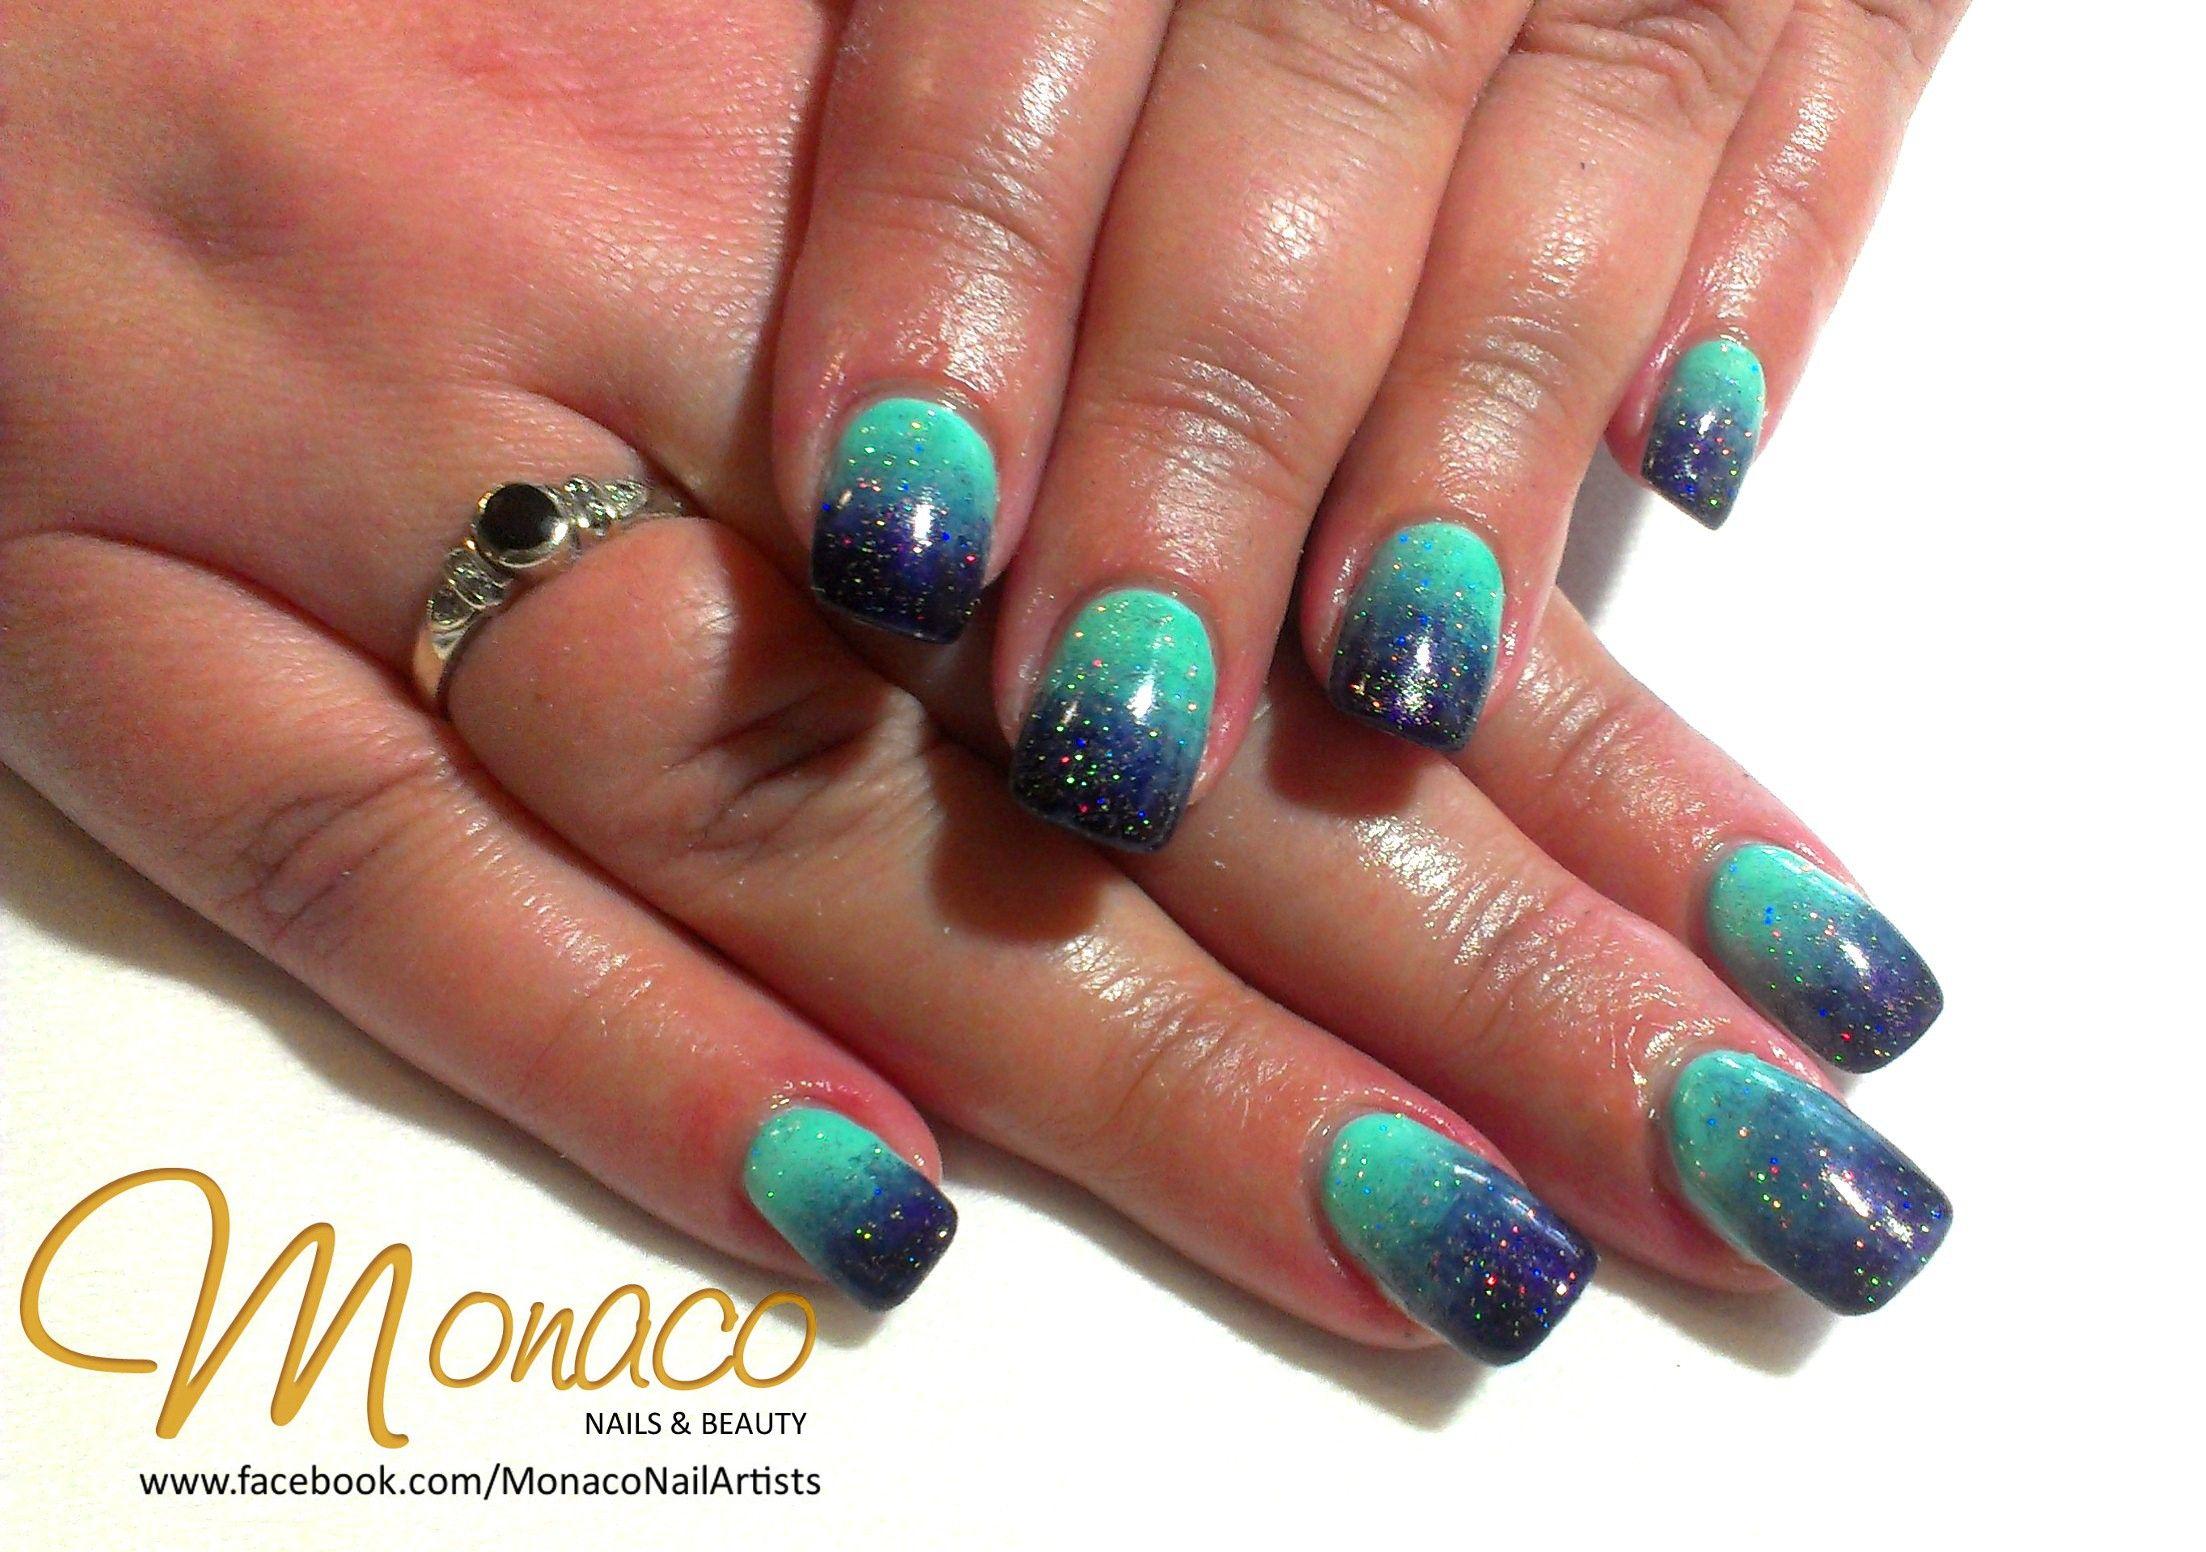 Ombre ColourGloss Nails! NailsByMonaco do an amazing job